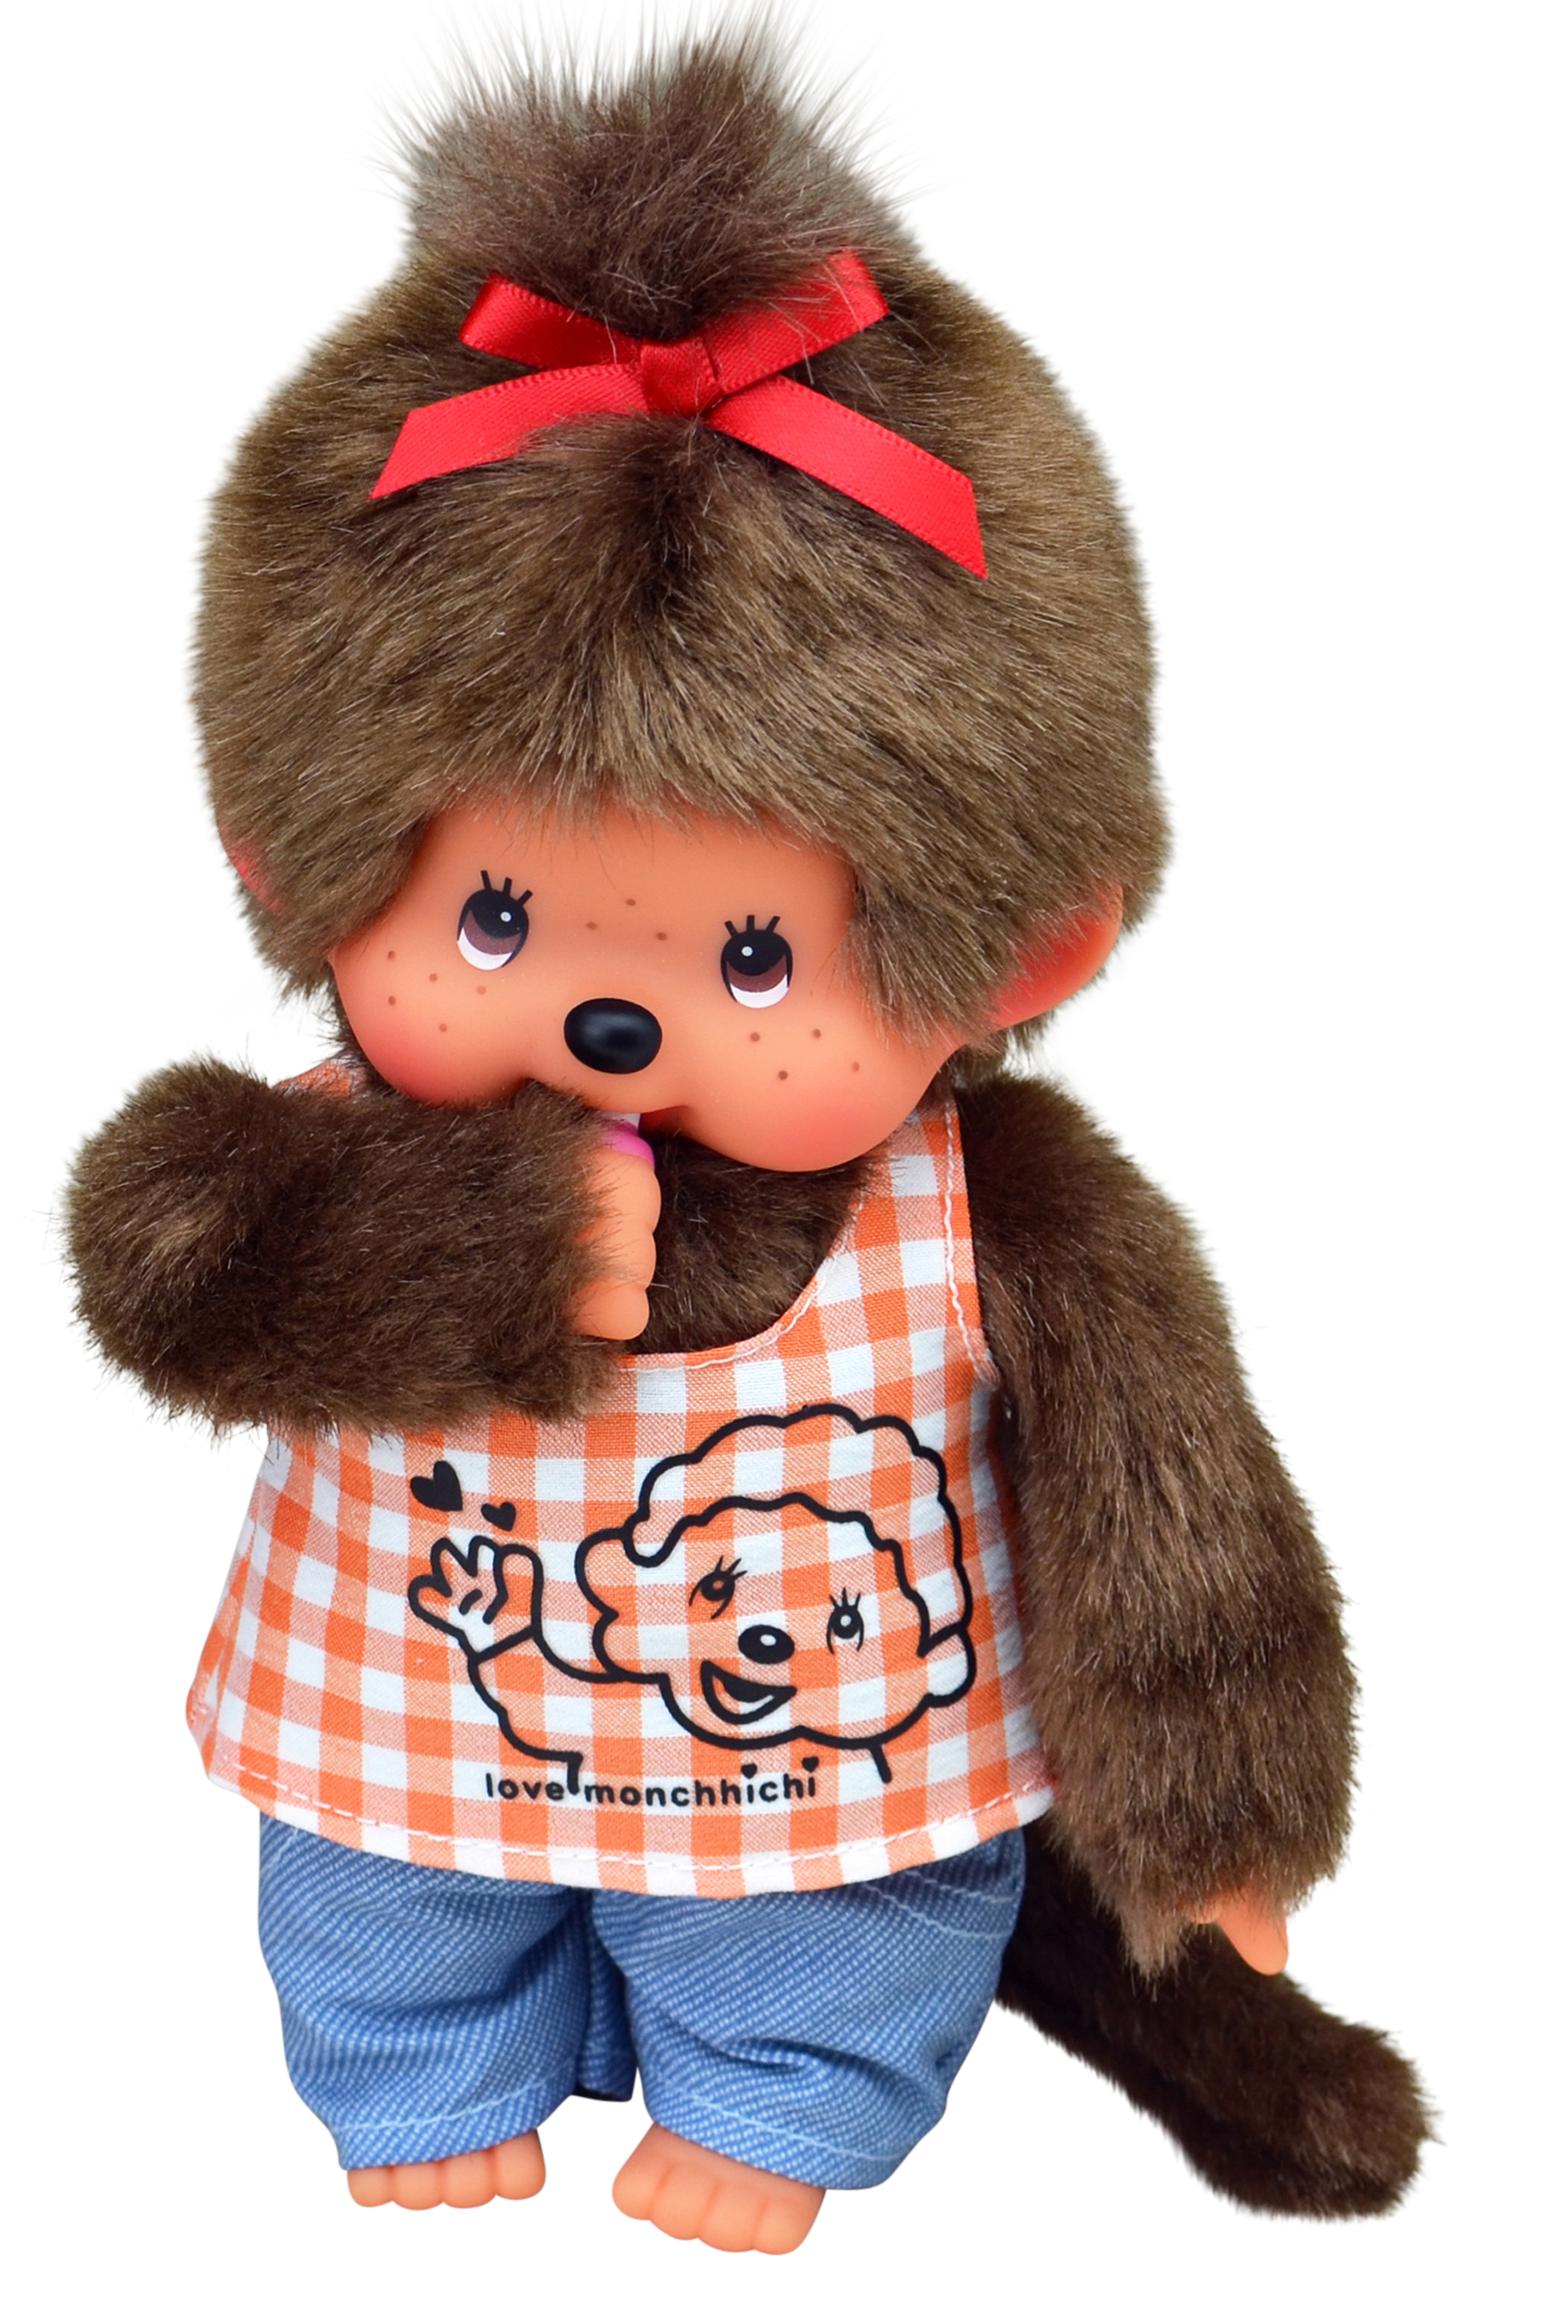 Orange Shirt Girl Monchhichi